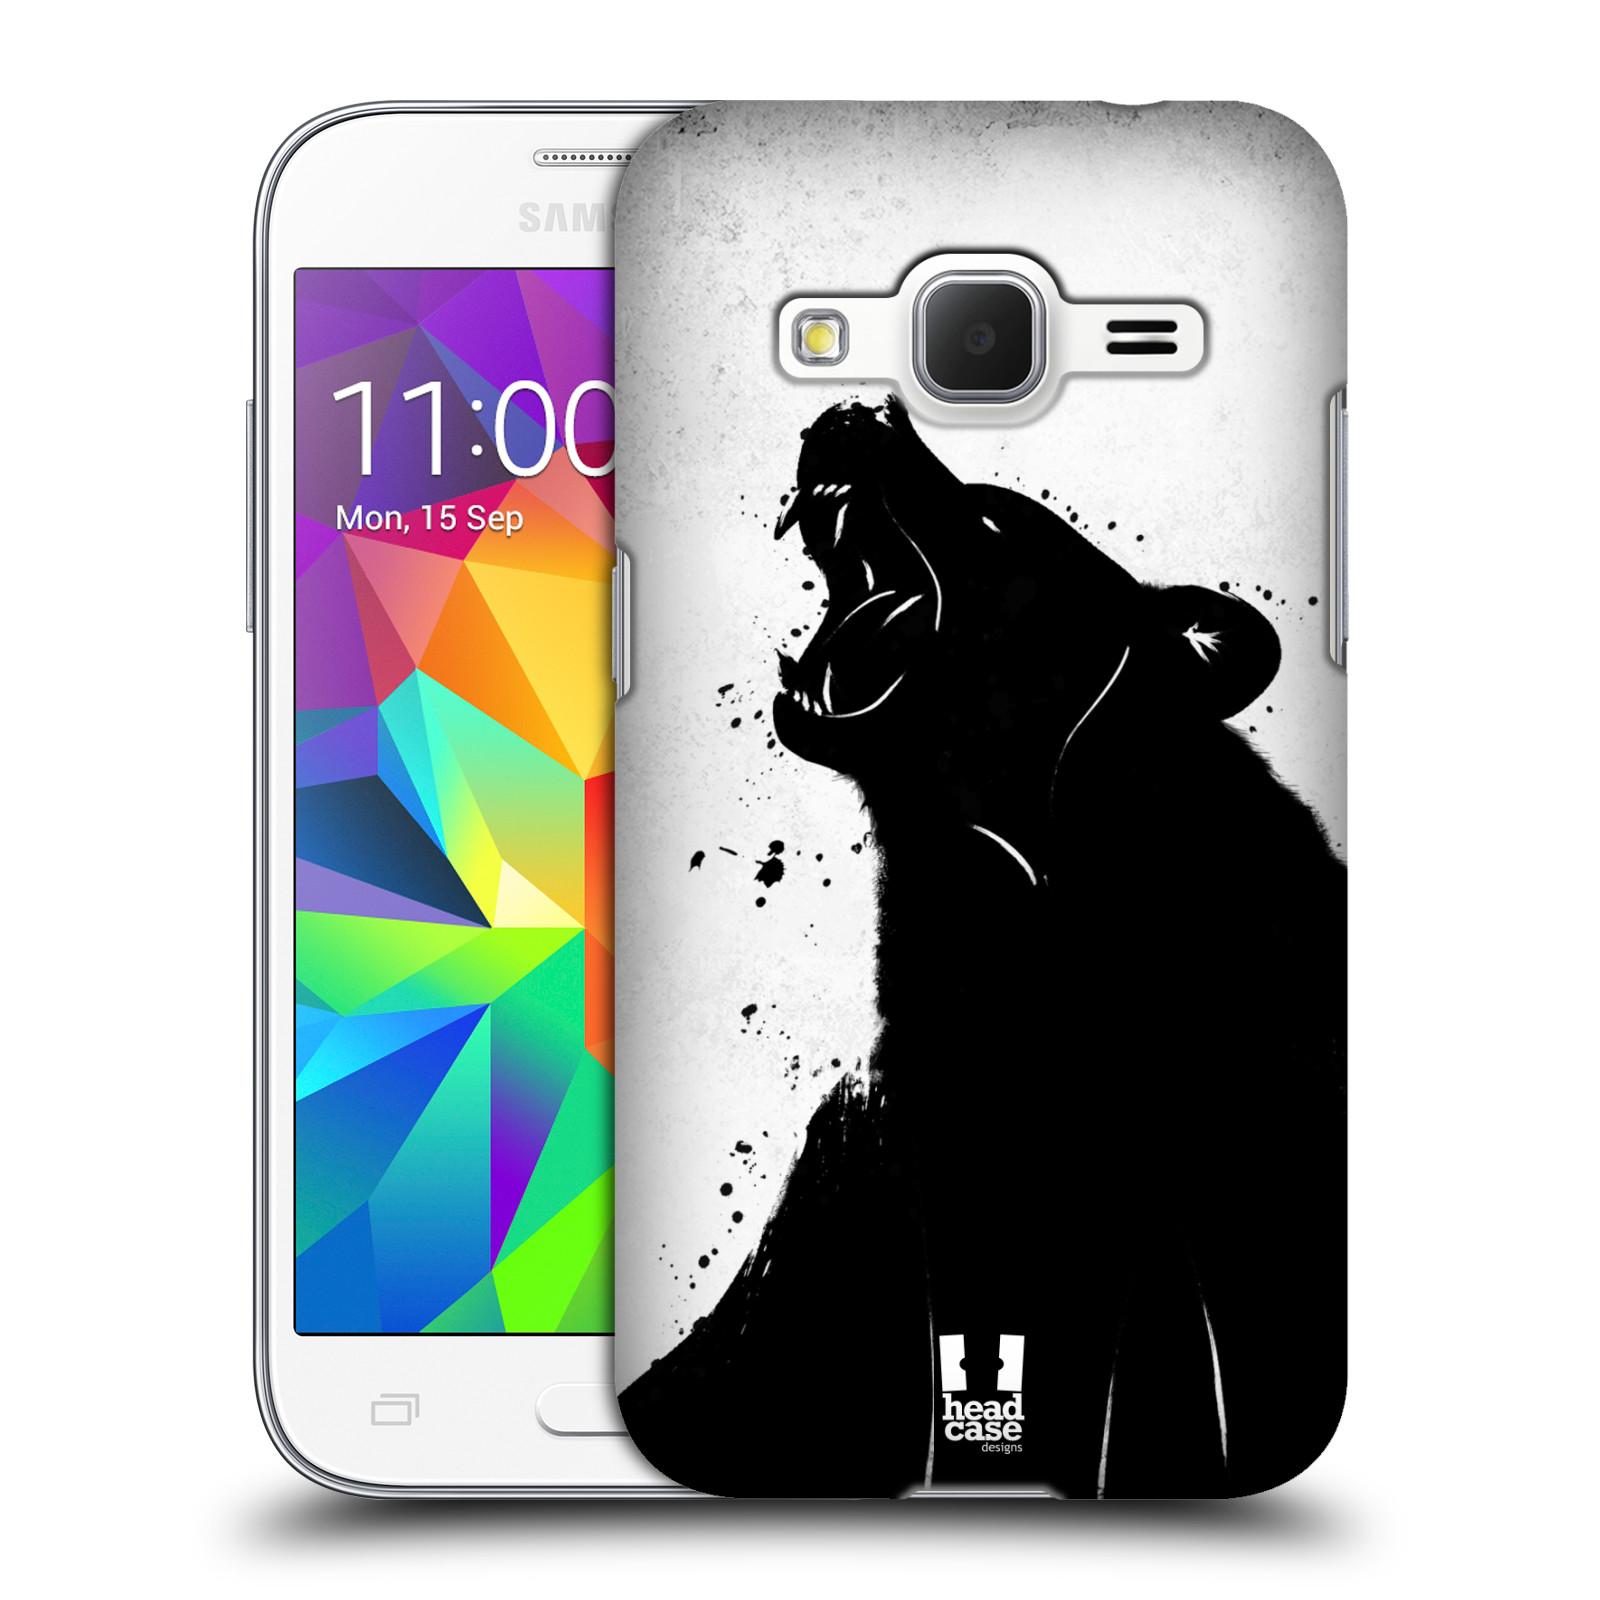 HEAD CASE plastový obal na mobil SAMSUNG GALAXY Core Prime (Core Prime VE) vzor Kresba tuš zvíře medvěd